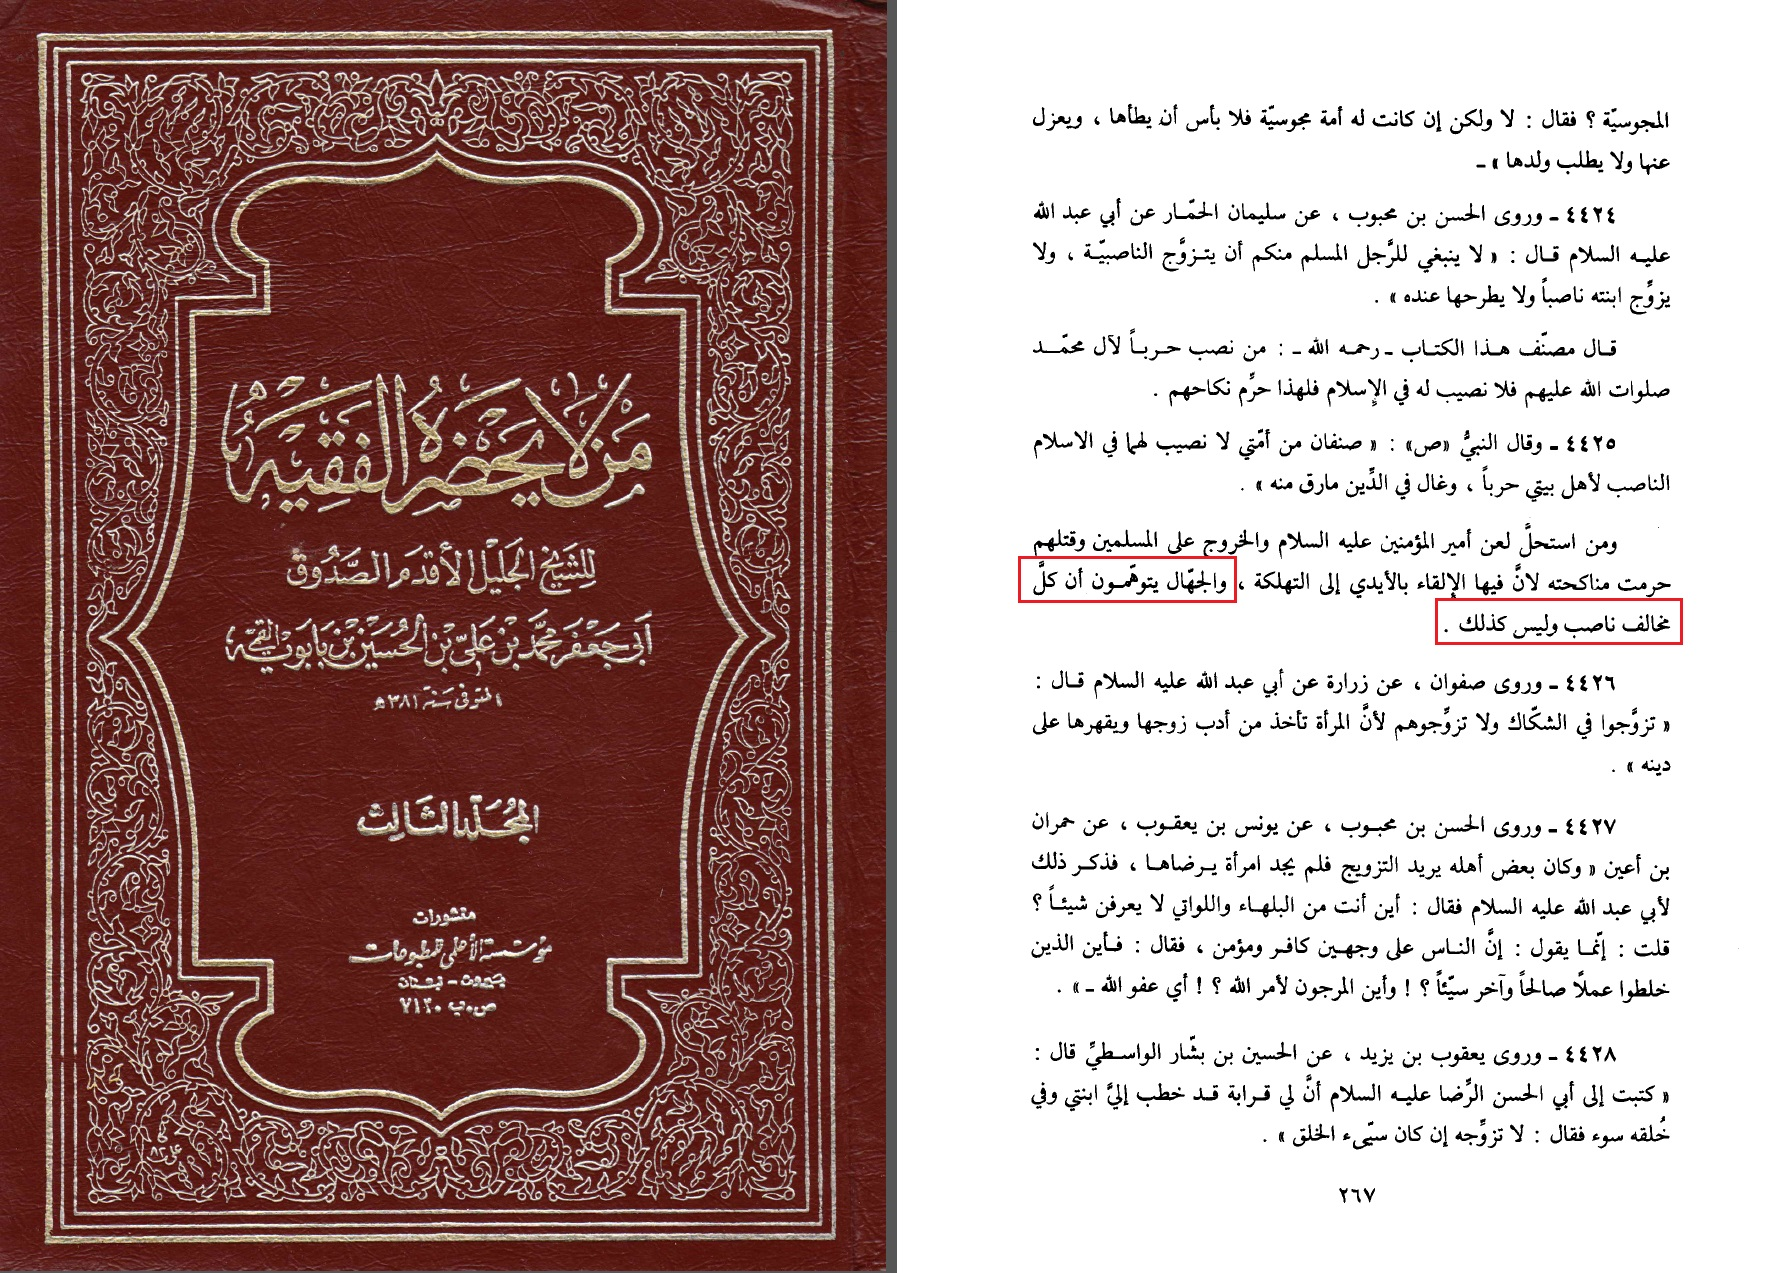 Man La Ya7duruh-ul-FaQih - B 3 S 267